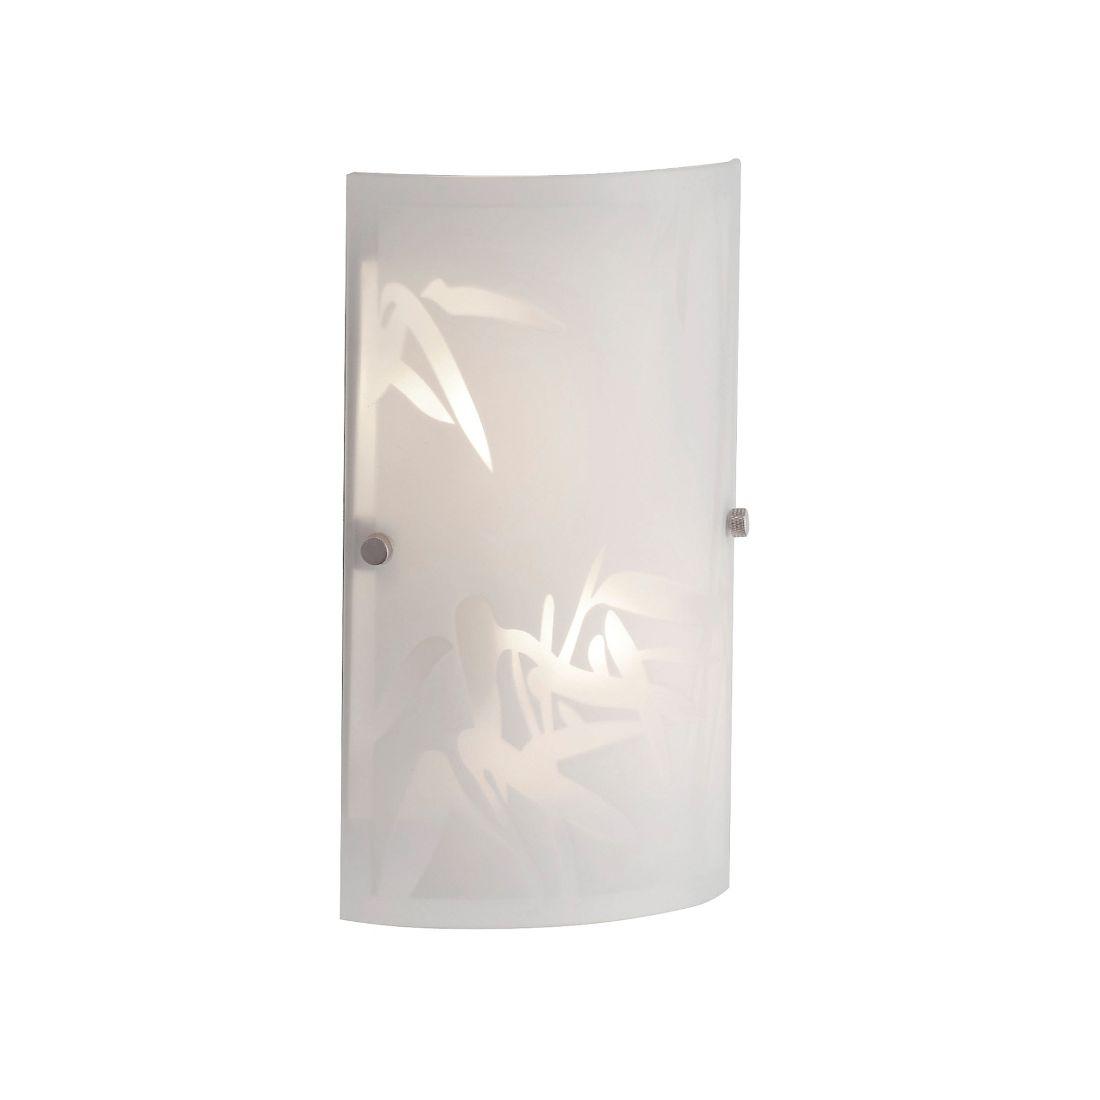 wandleuchte wandlampe lampe flur diele wohnzimmer wei. Black Bedroom Furniture Sets. Home Design Ideas